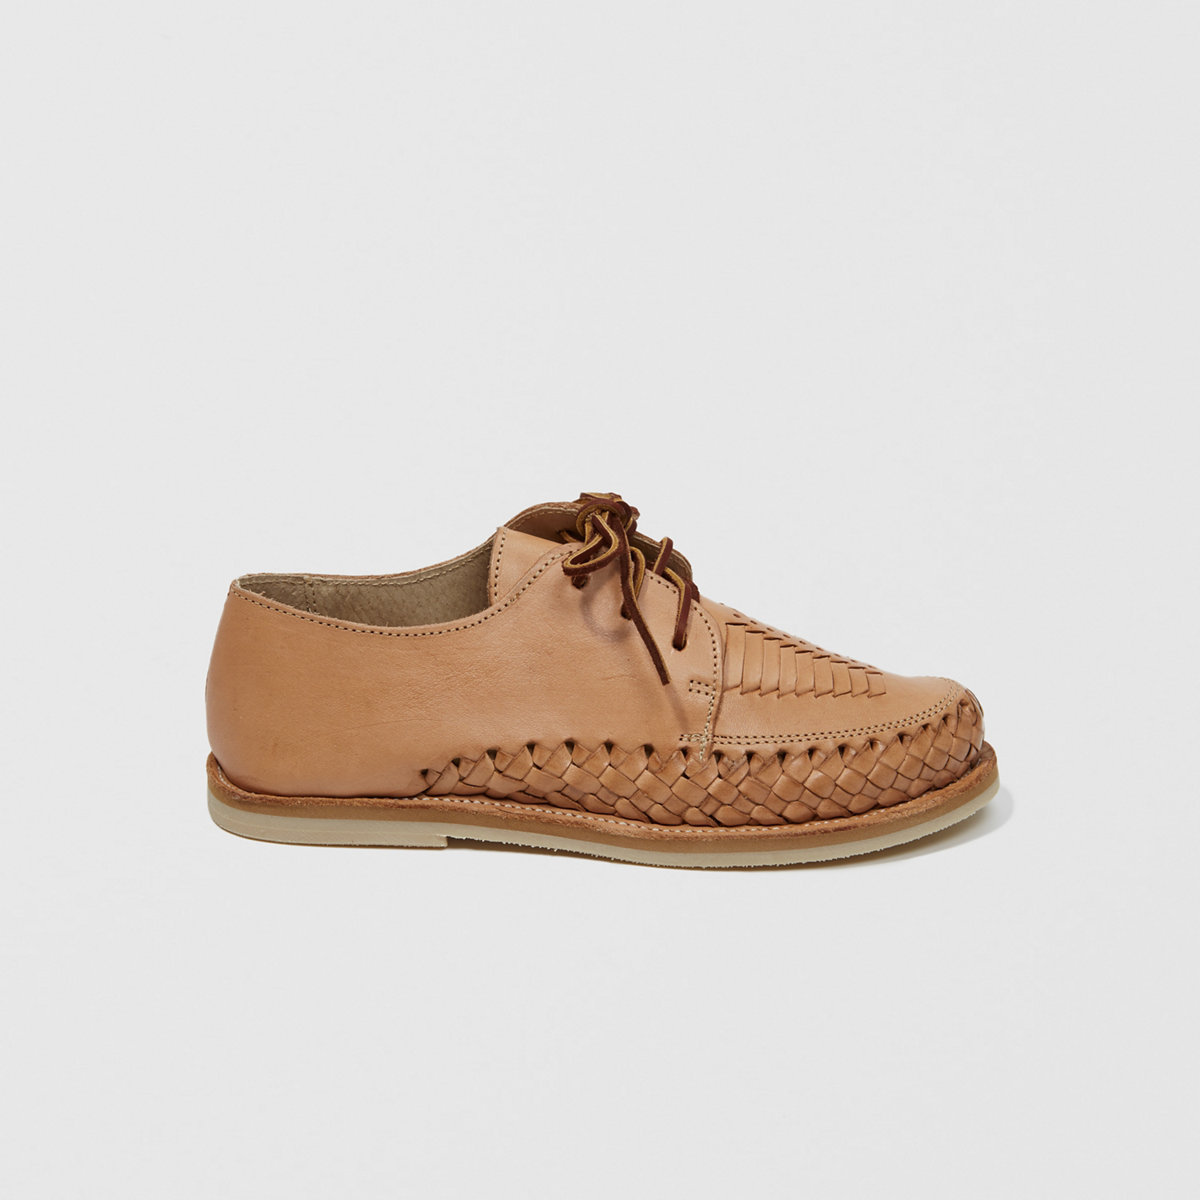 Chamula Veracruz Huarache Shoe